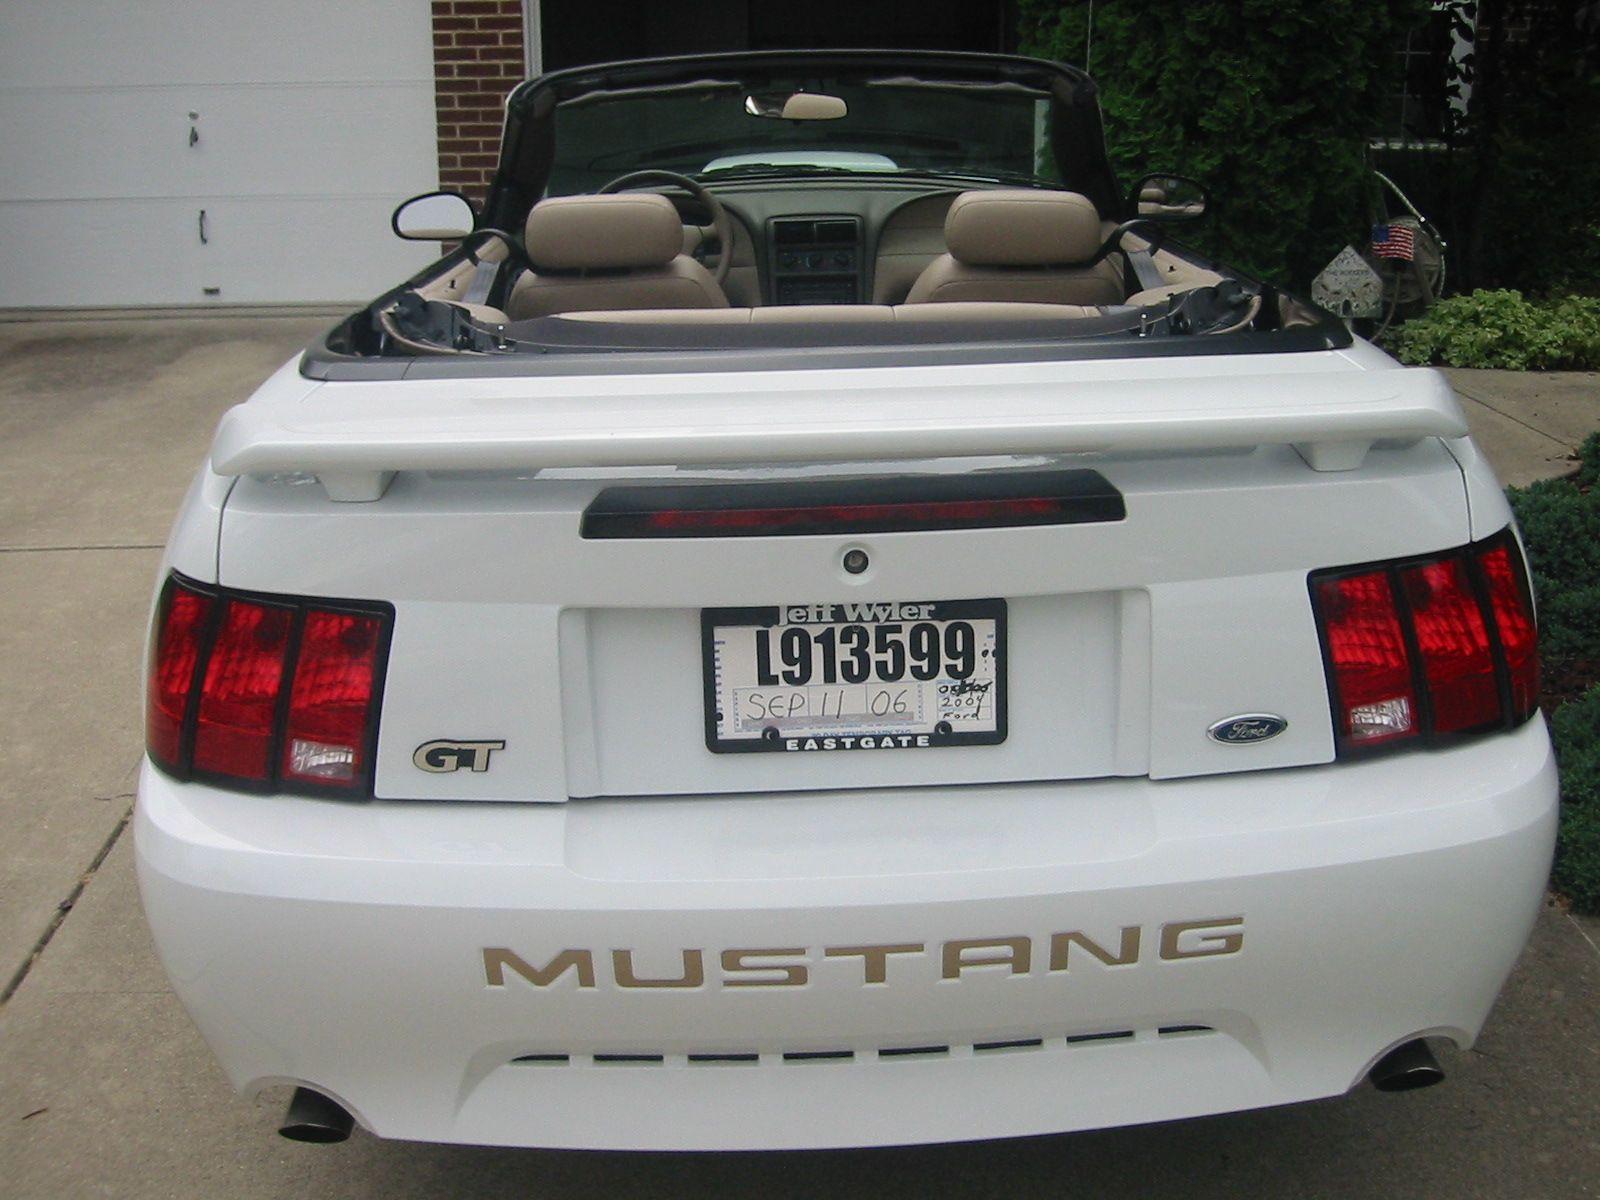 2004 Mustang GT Convertible Mustang, Ford trucks, Mustang gt